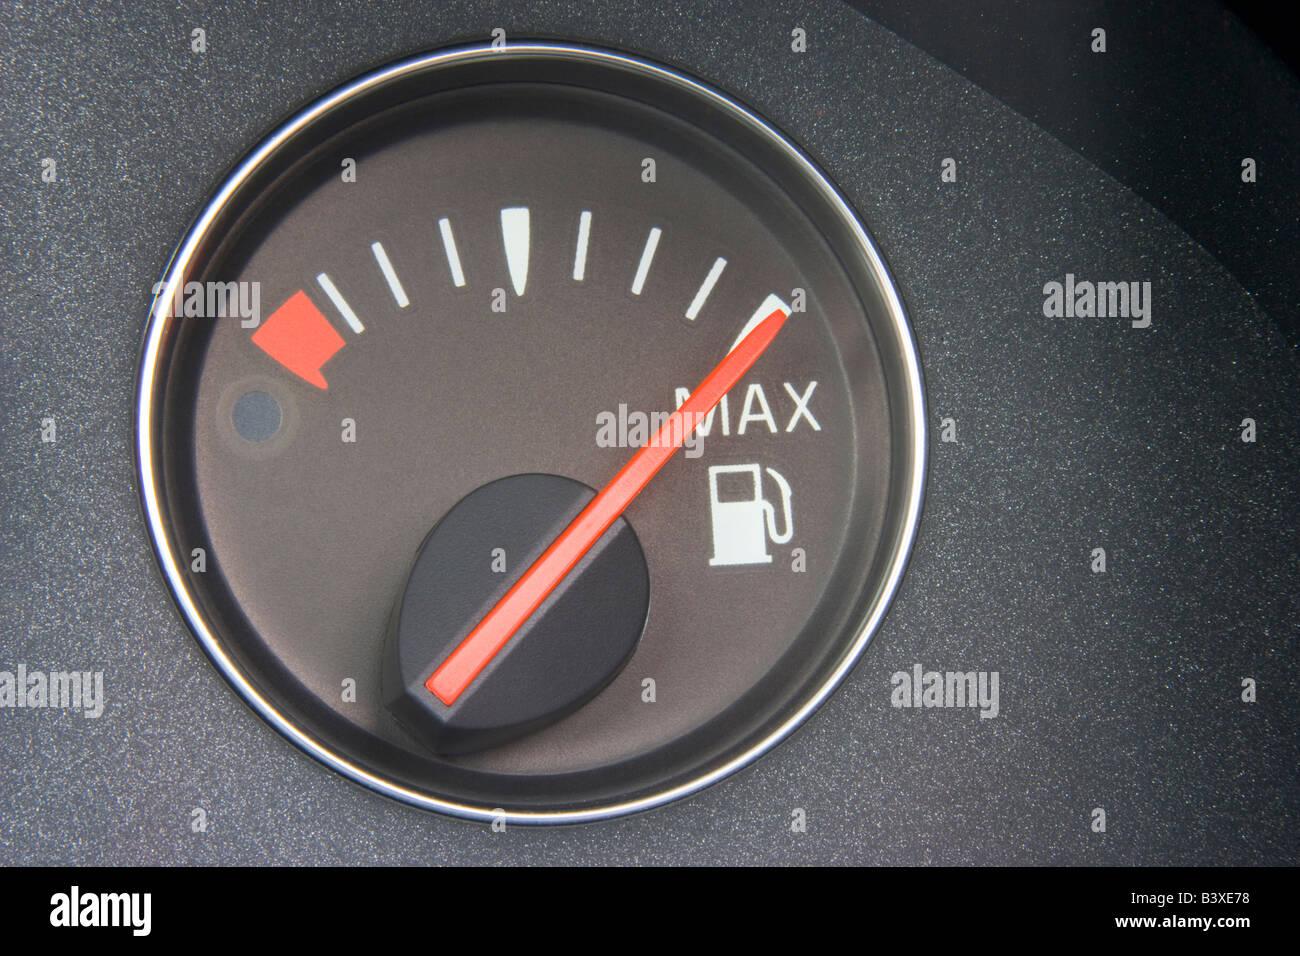 Fuel Gauge Reading Full - Stock Image